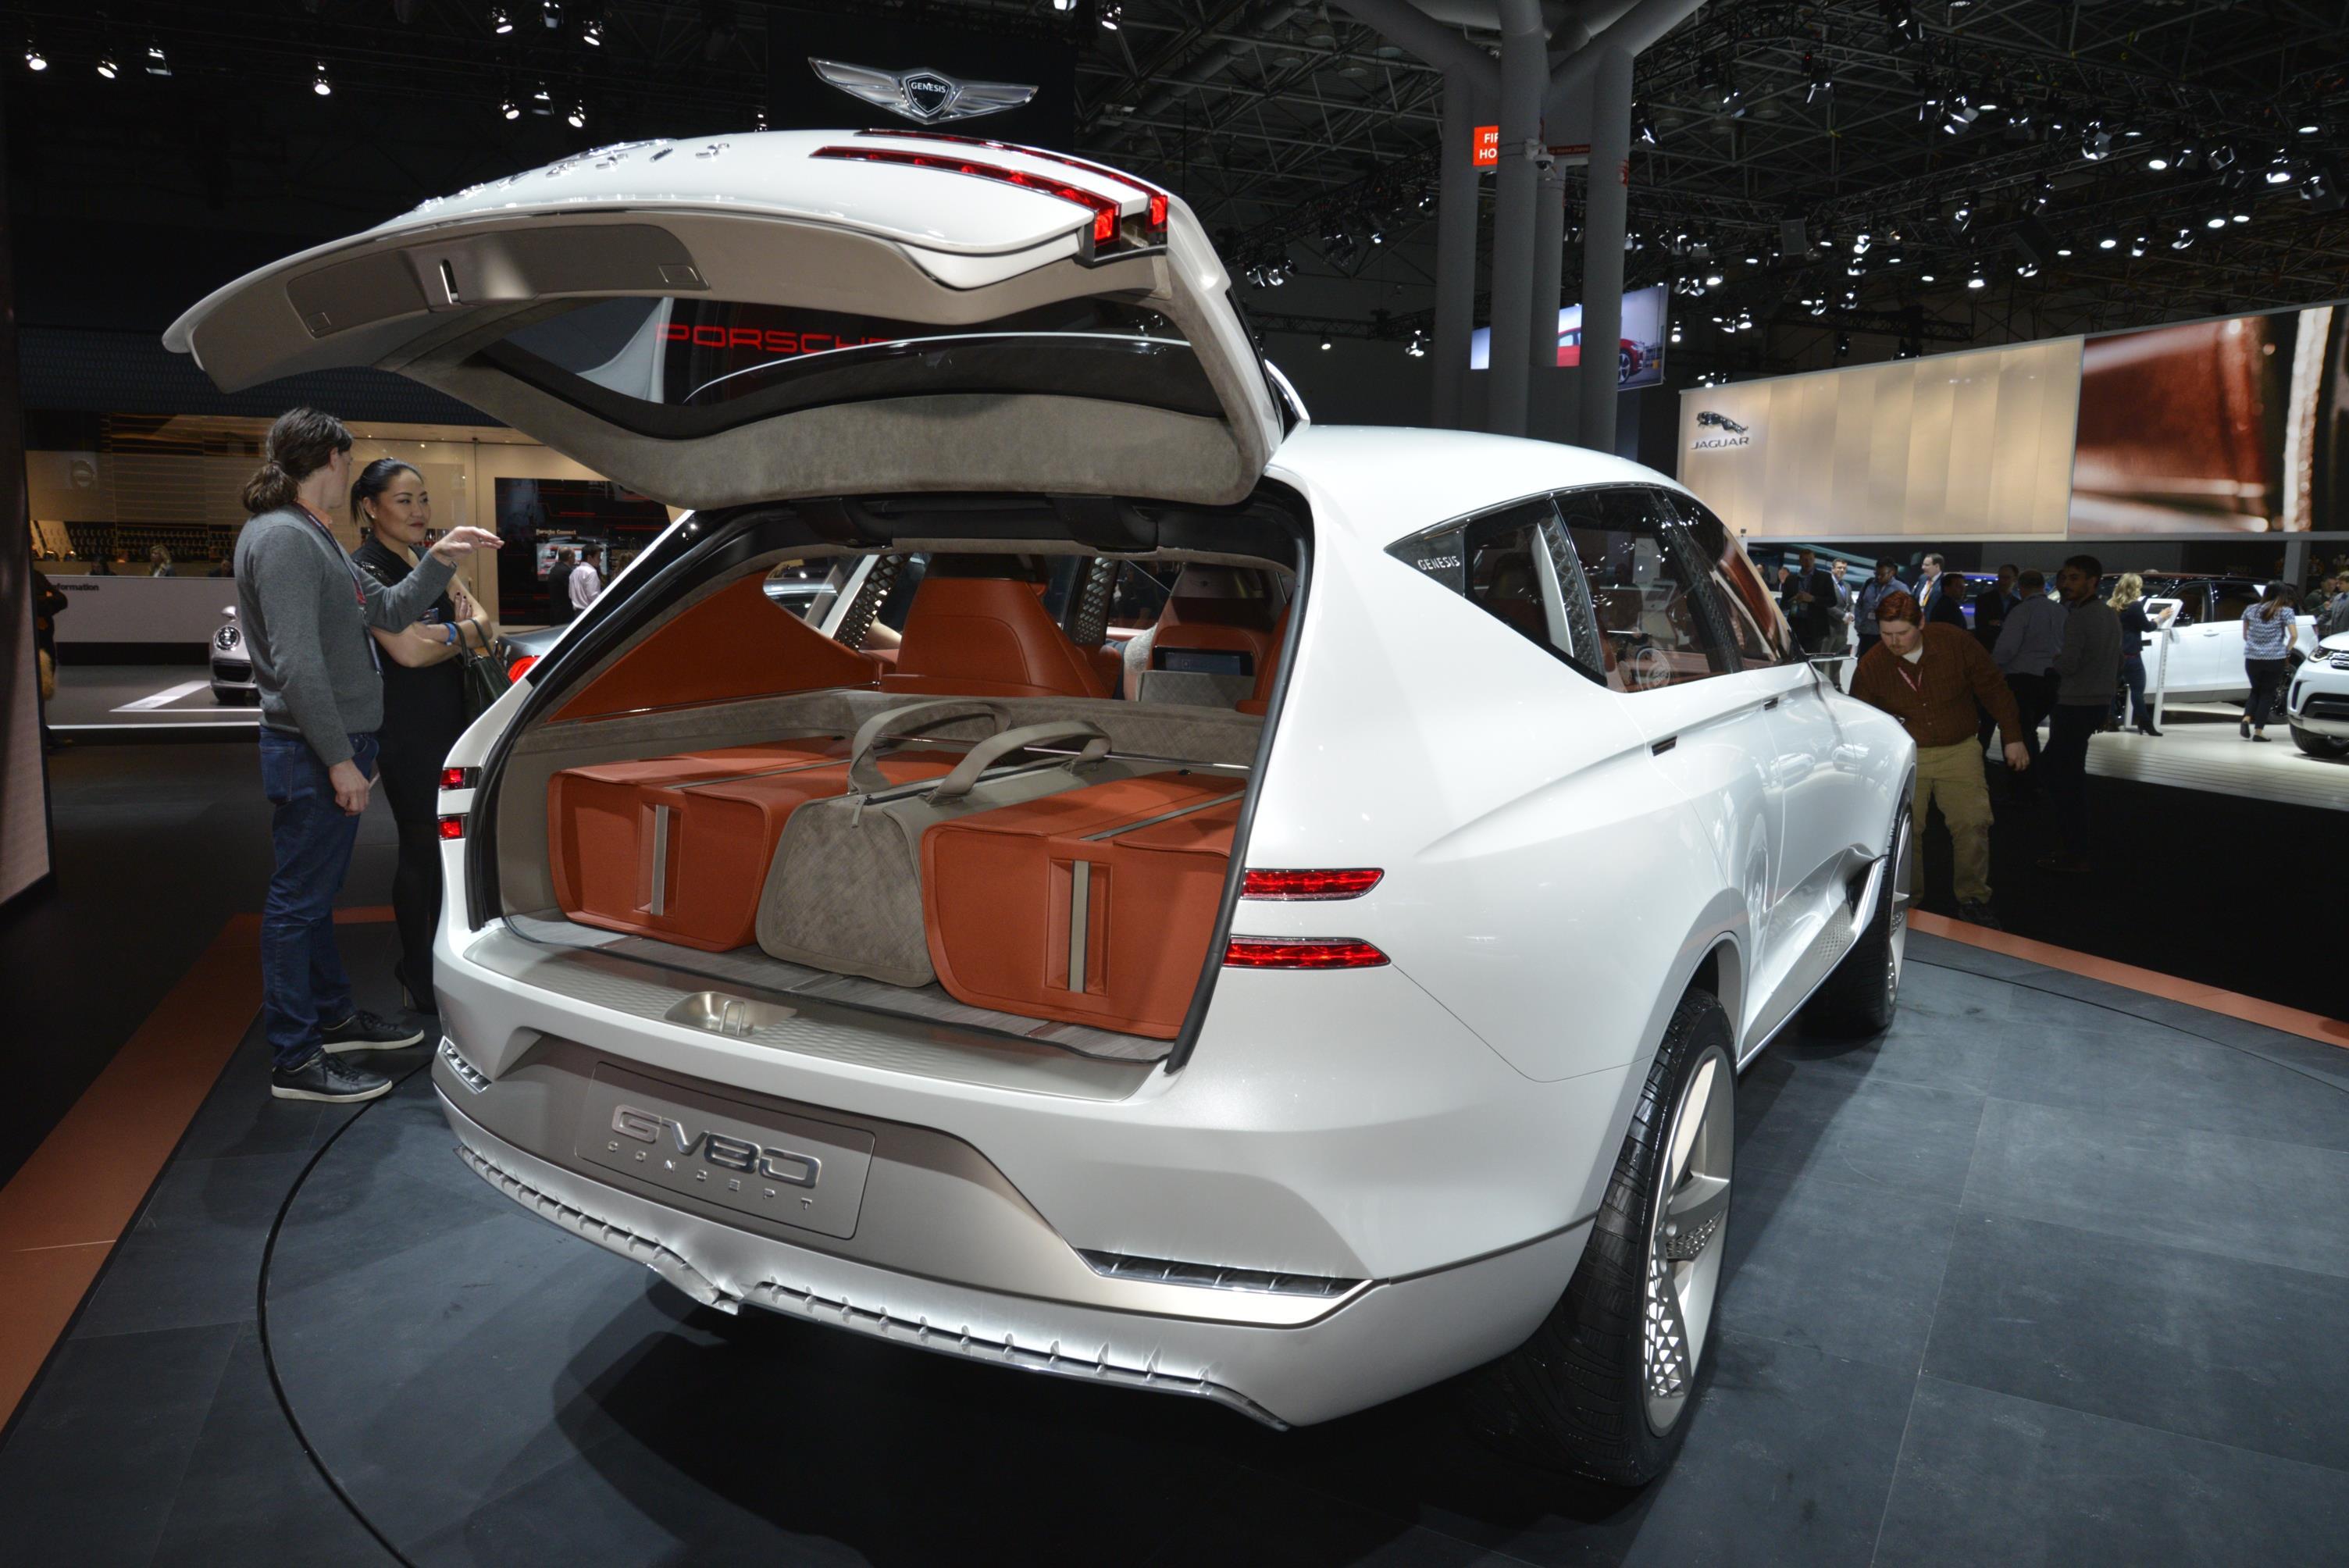 2017 Hyundai Genesis Release Date >> GENESIS REVEALS GV80 FUEL CELL CONCEPT - myAutoWorld.com